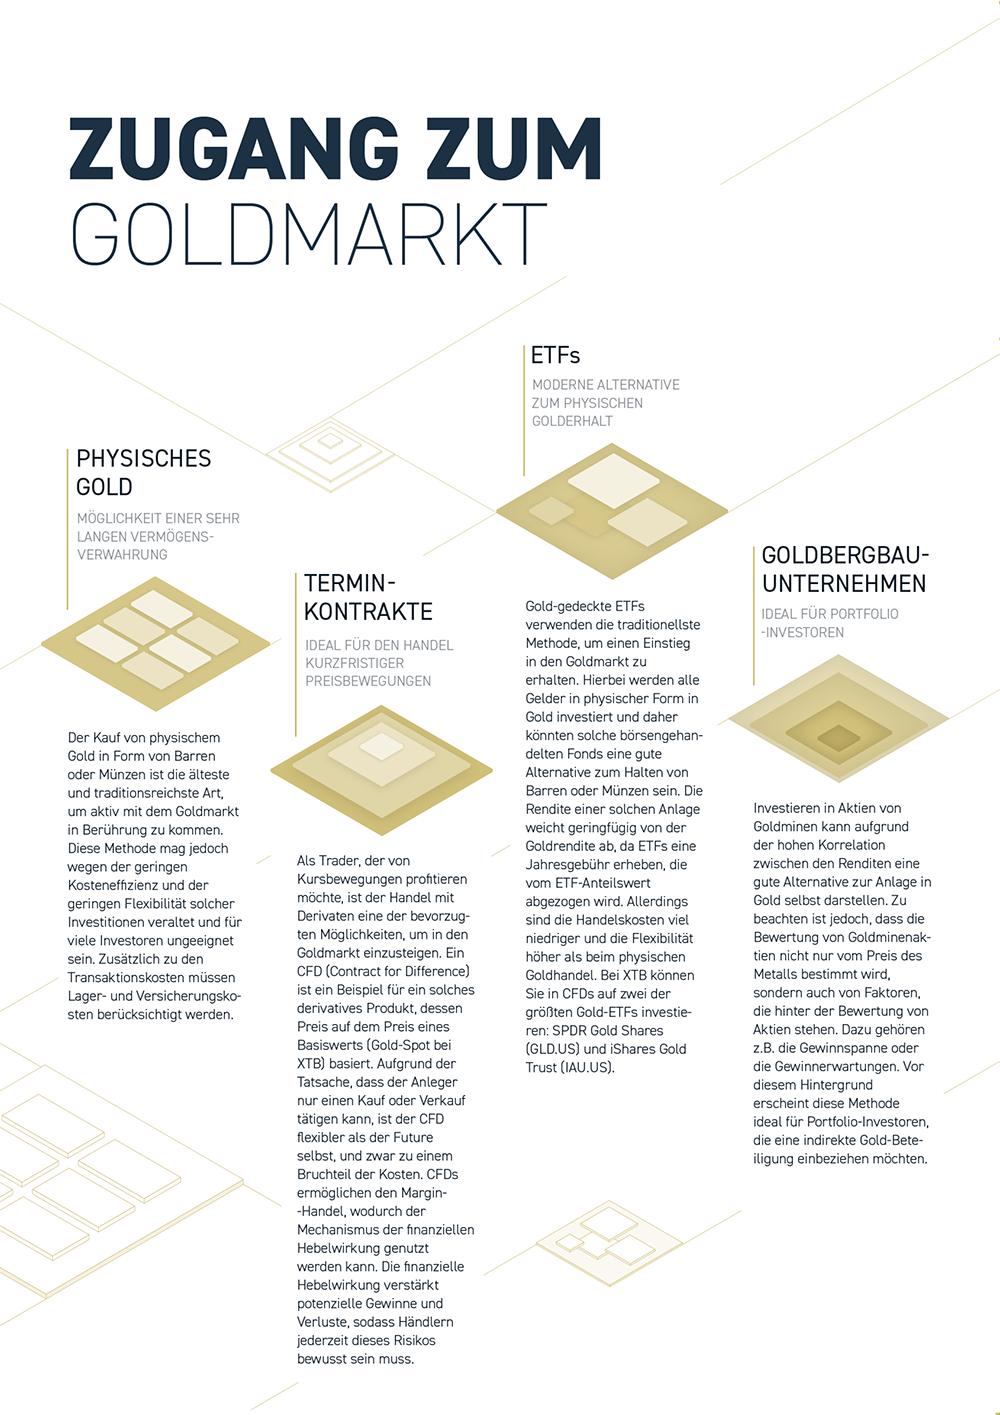 DE_Gold Strategy-Guide_ESMA79-5 (1)